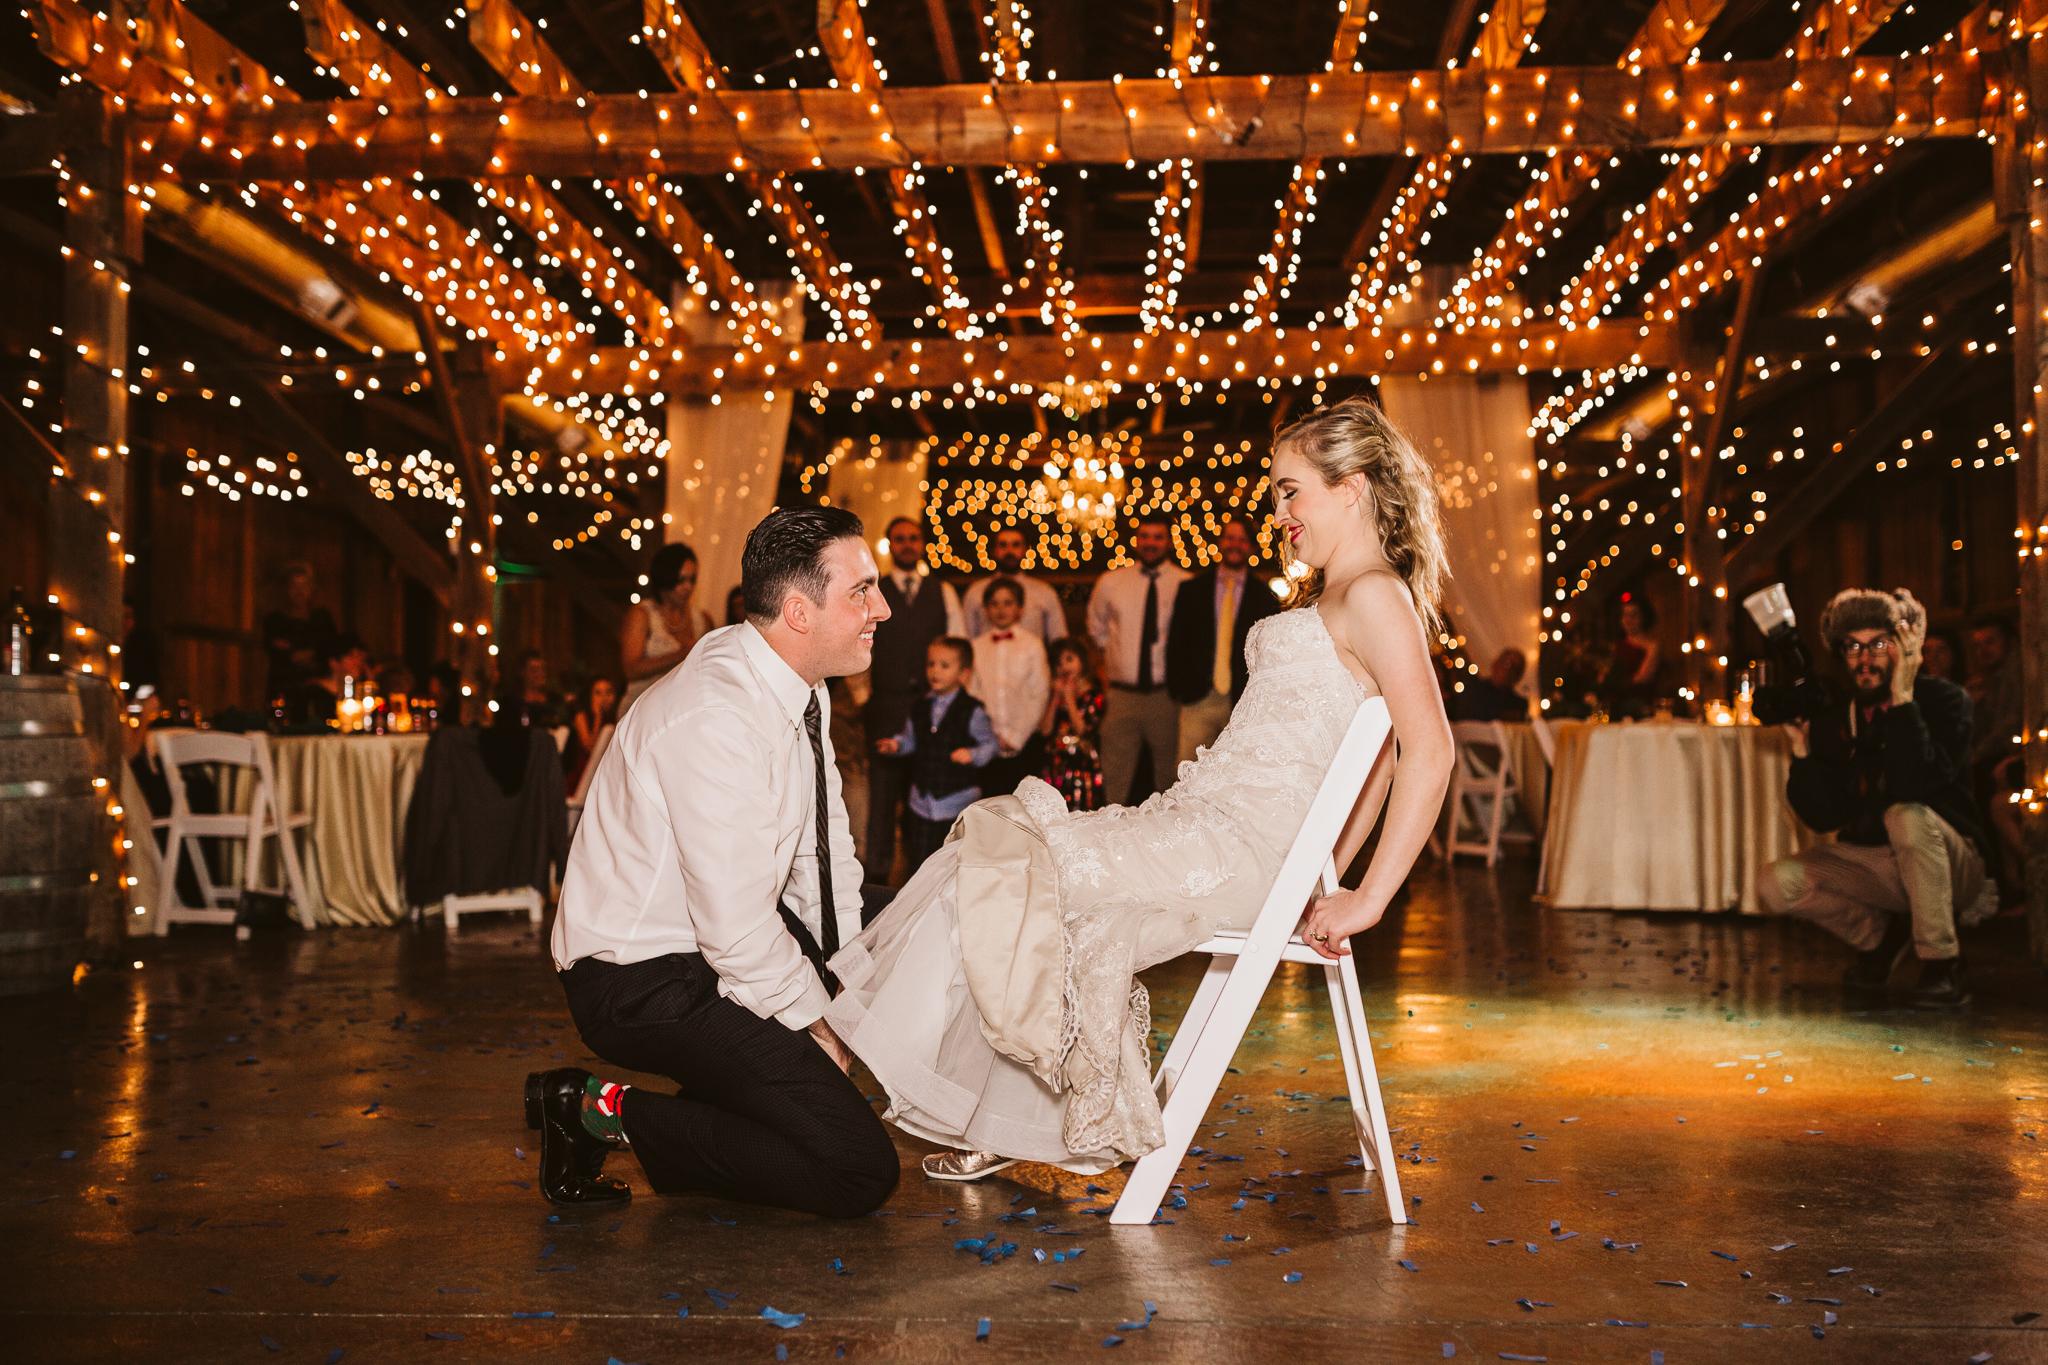 0175 Ariana Jordan Photo - Cameron & Lauren's Wedding at Talon Winery  8249.jpg